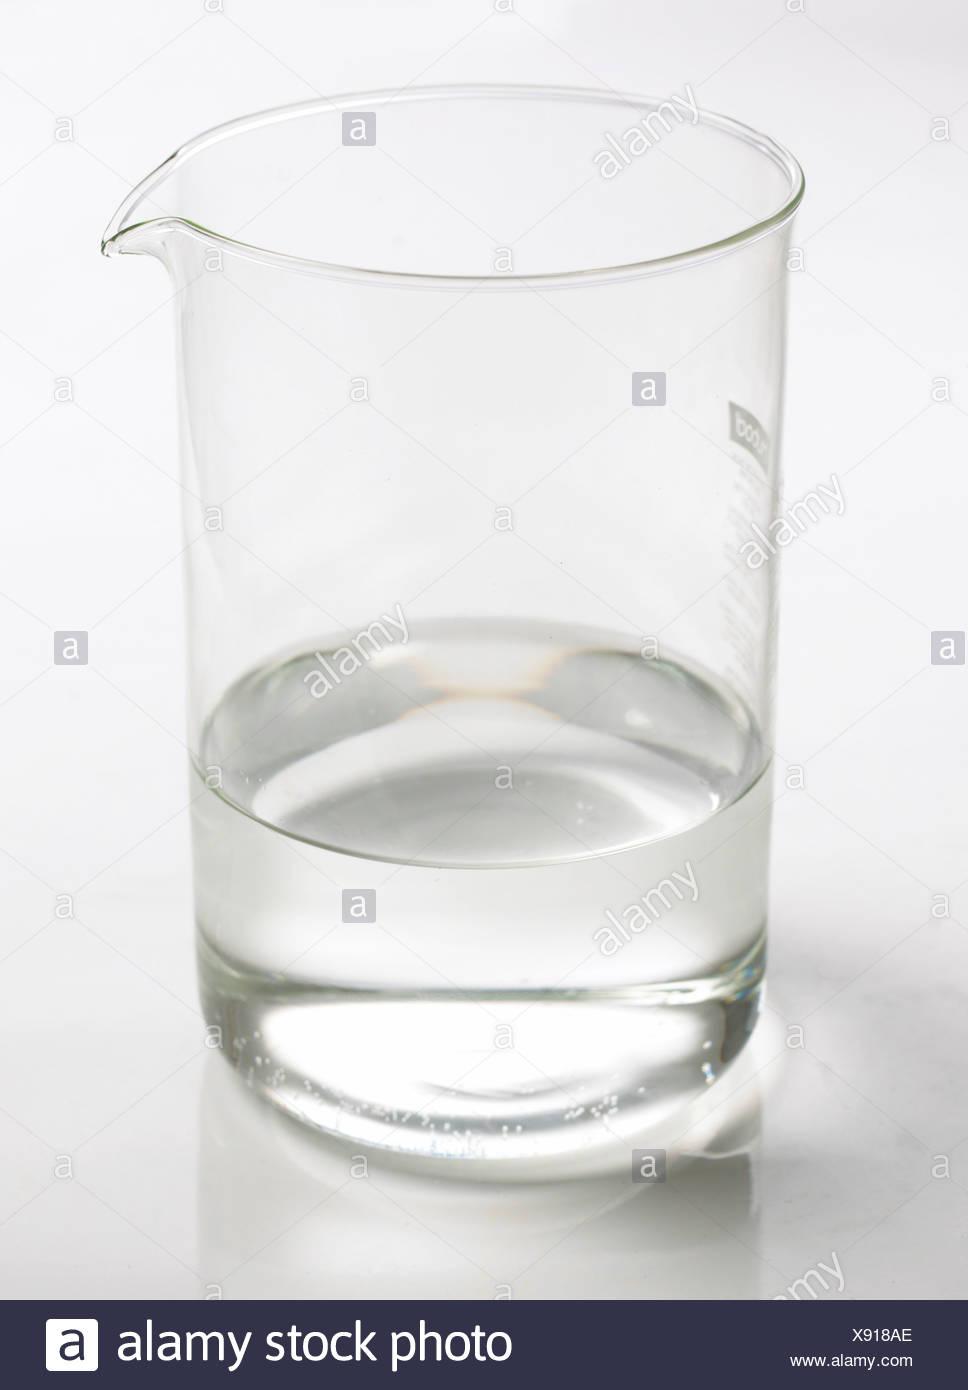 Beaker of water on white background - Stock Image